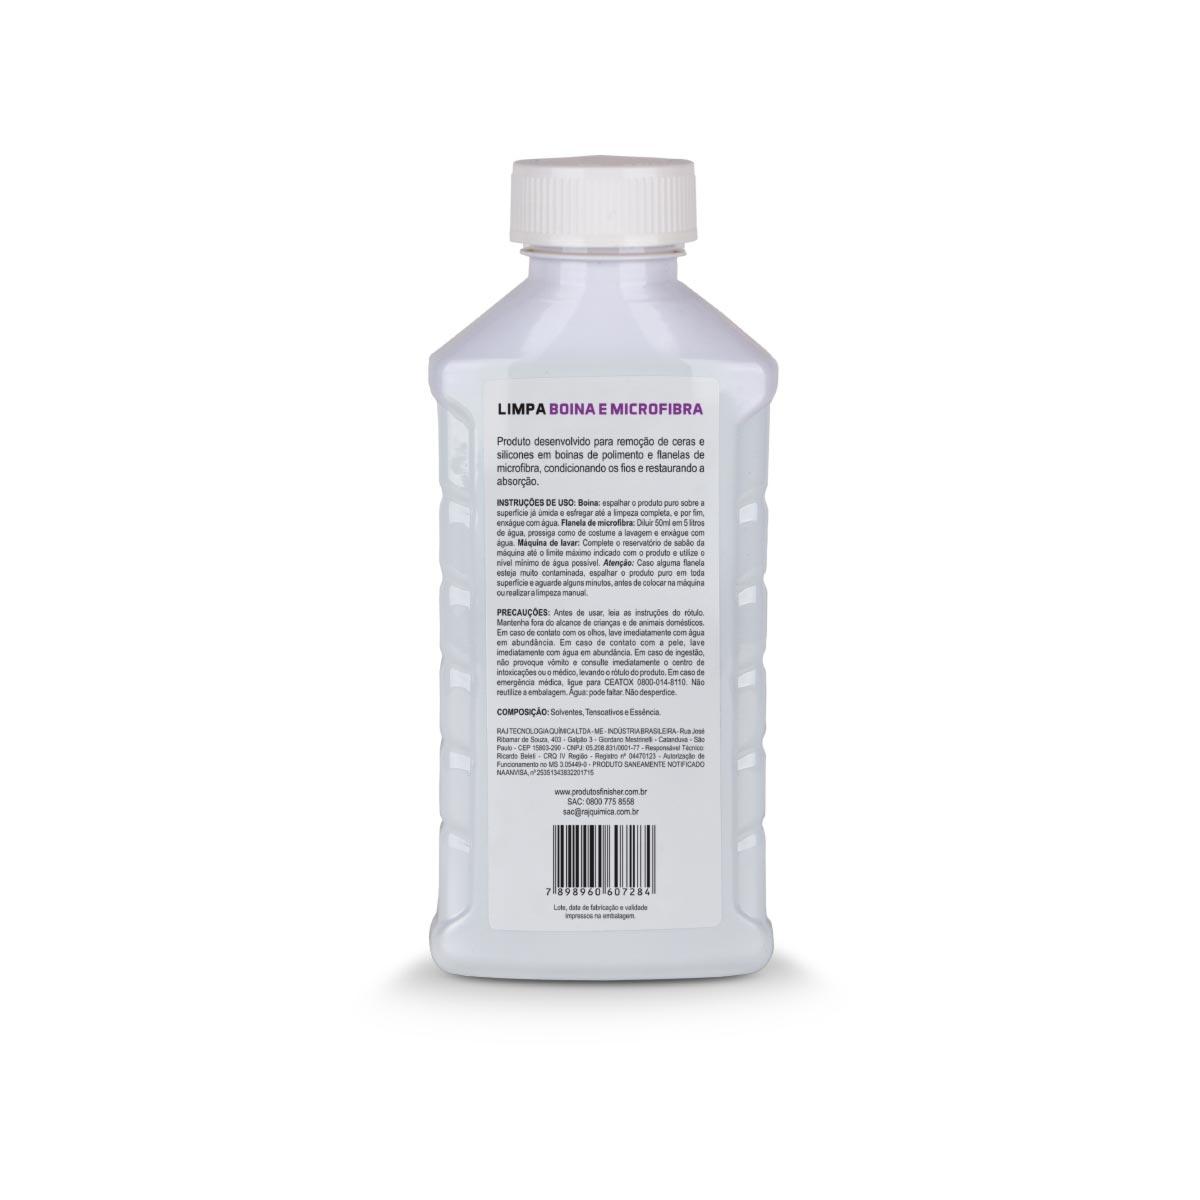 Shampoo Limpa Boina Microfibra Concentrado 500ml Finisher